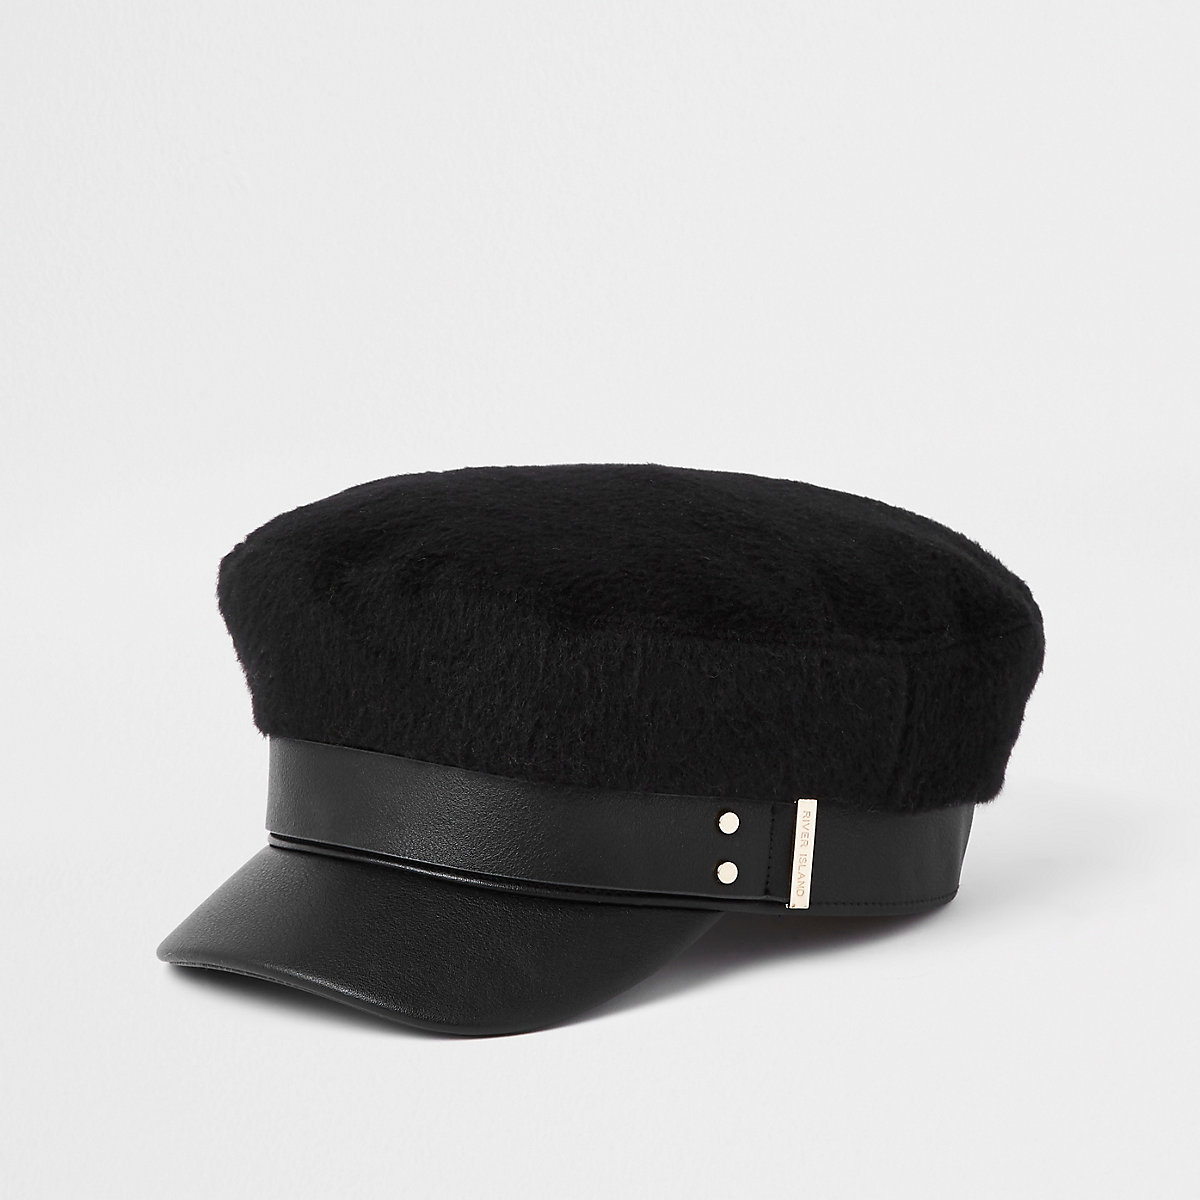 Black brushed baker boy hat - Hats - Accessories - women 464a4111ac5